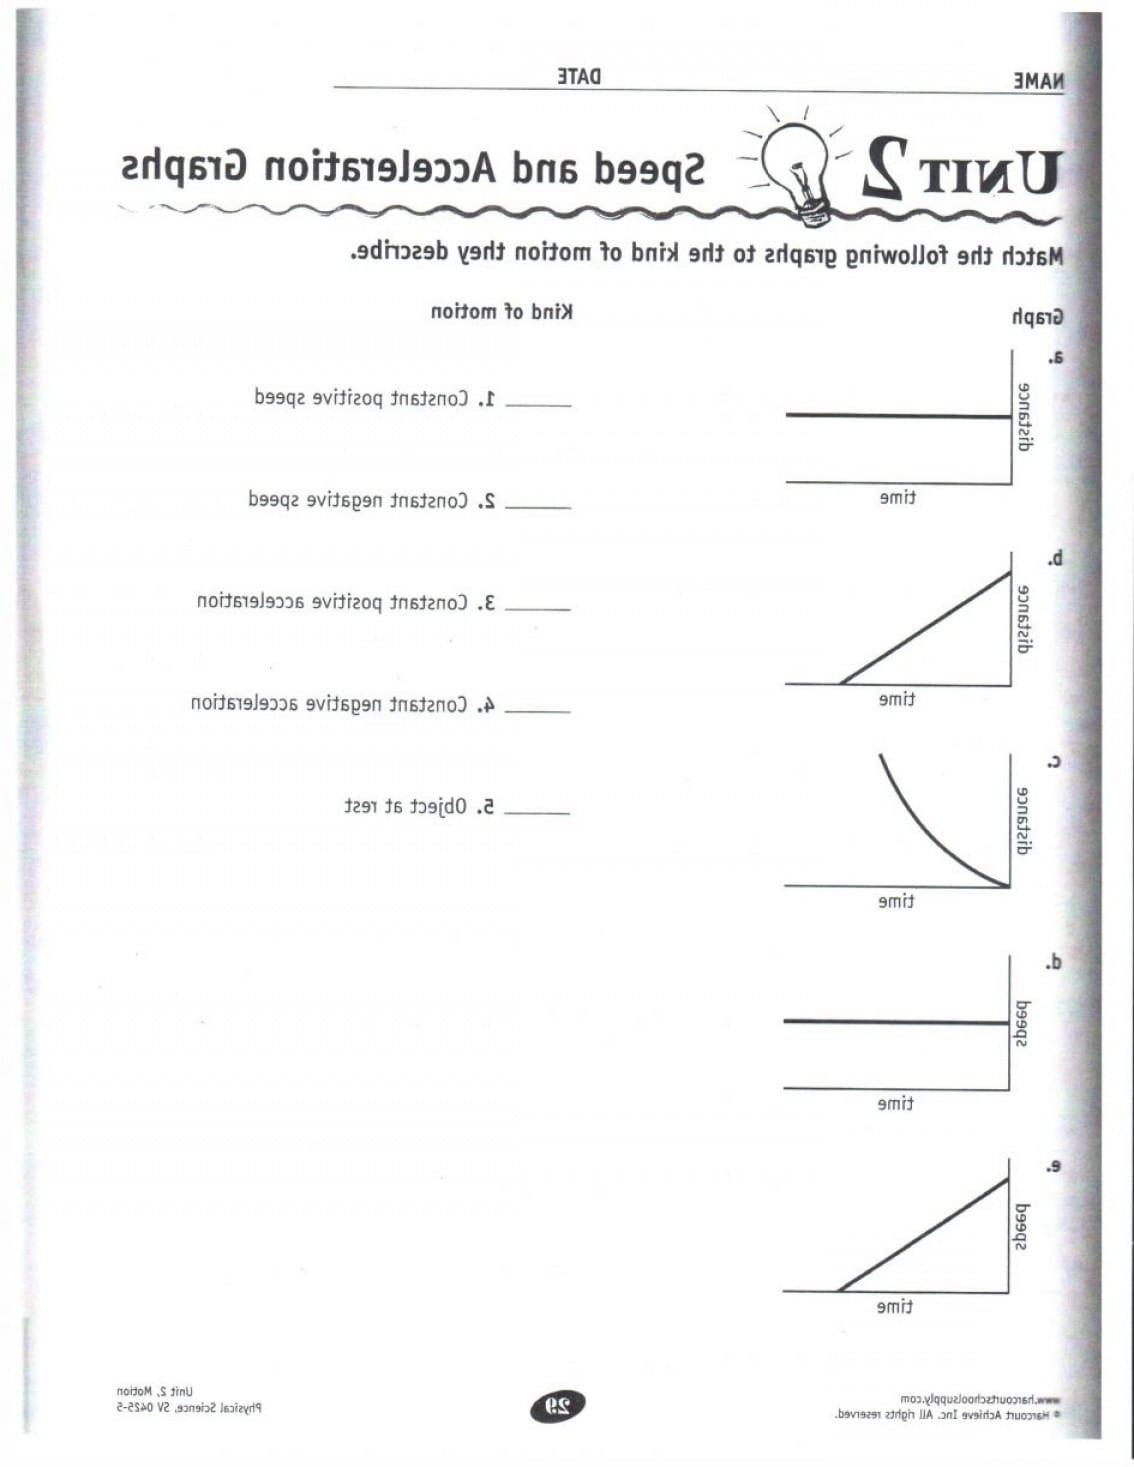 Free Body Diagram Worksheet Answers torque Physics Fundamentals Worksheet